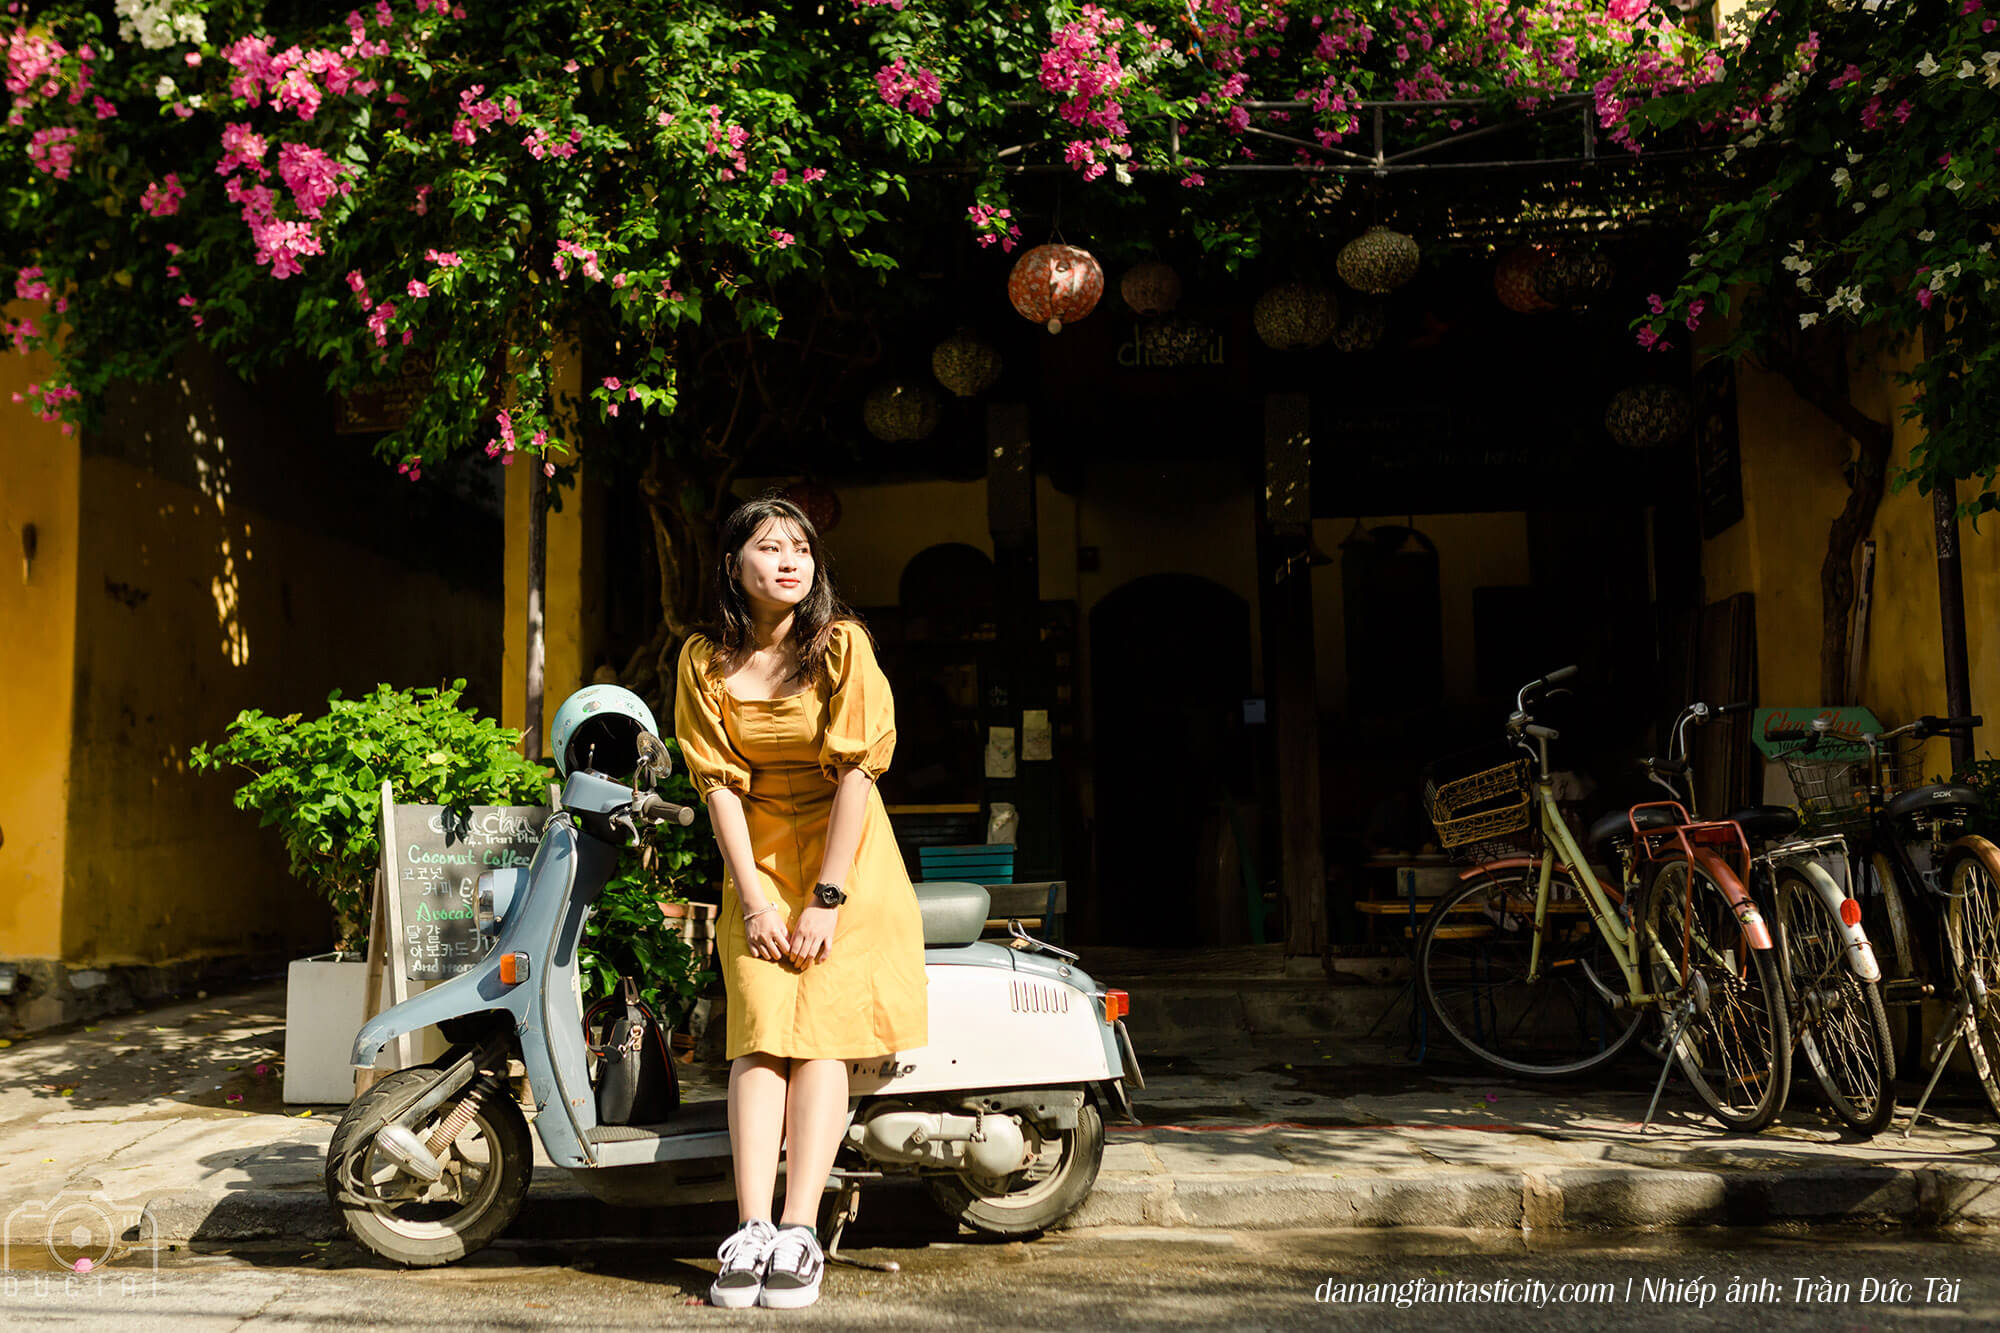 Pho Coi Hoi An Den Danang Hoi An Quang Nam Dung Quen Check In 03 Dia Diem Sieu Dep Nay 04